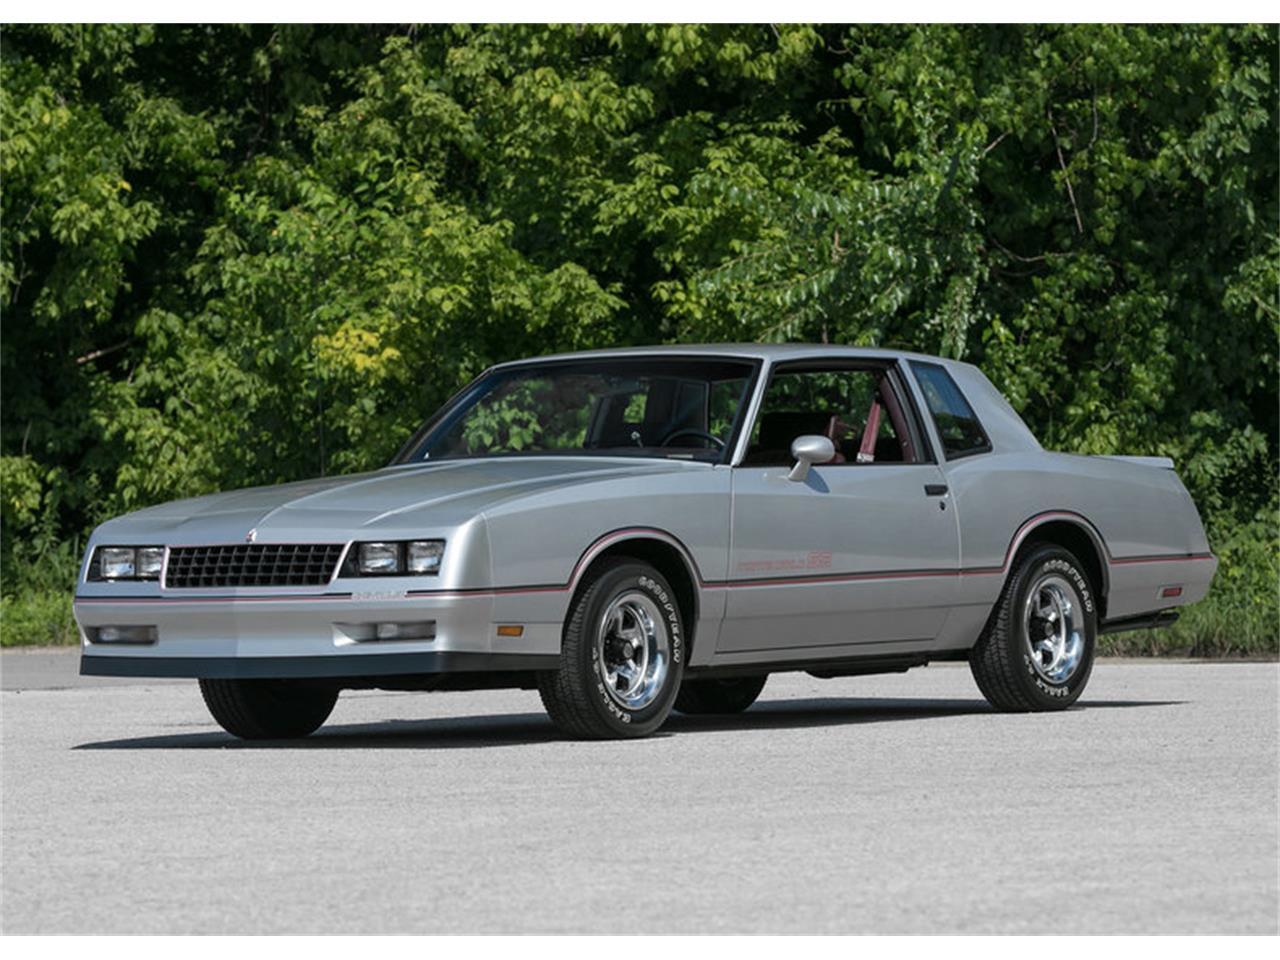 1985 Chevrolet Monte Carlo for Sale | ClassicCars com | CC-1154165